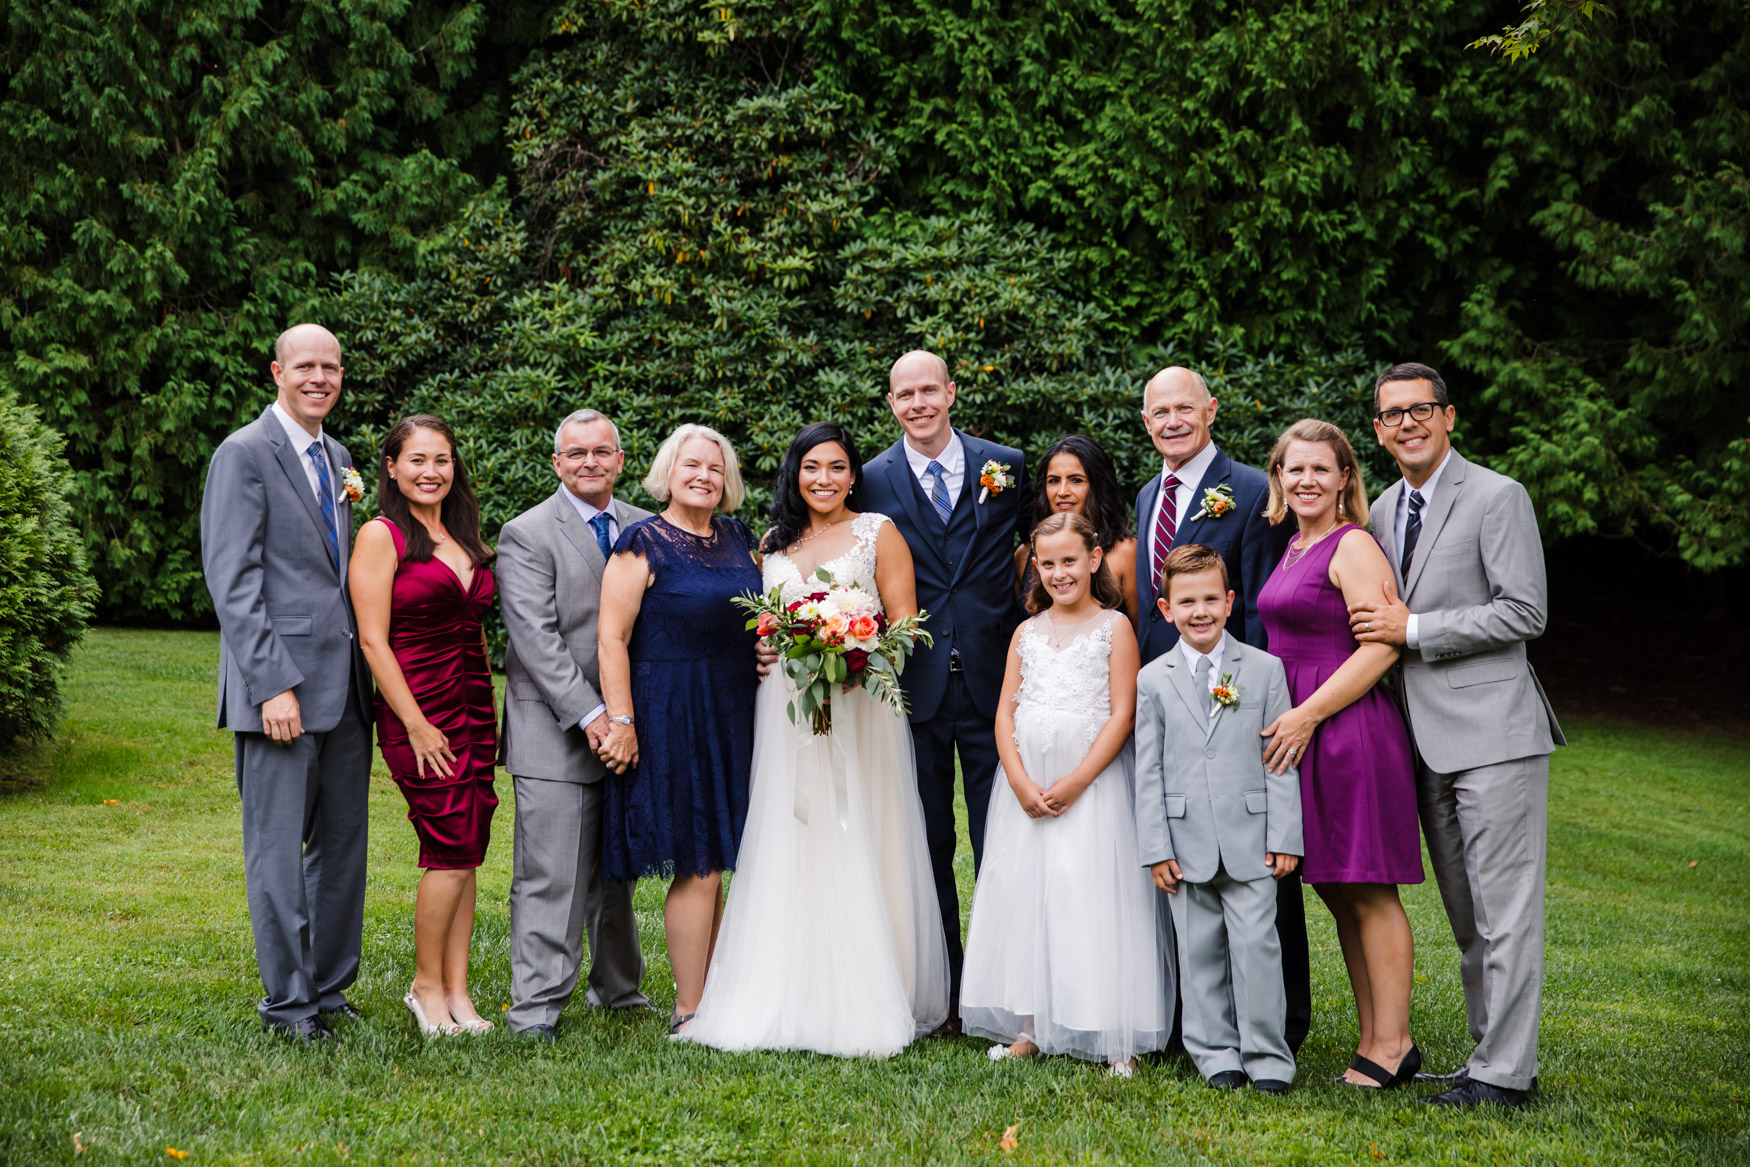 Family Portrait Waynesville NC Wedding Photography Inn at Tranquility Farm